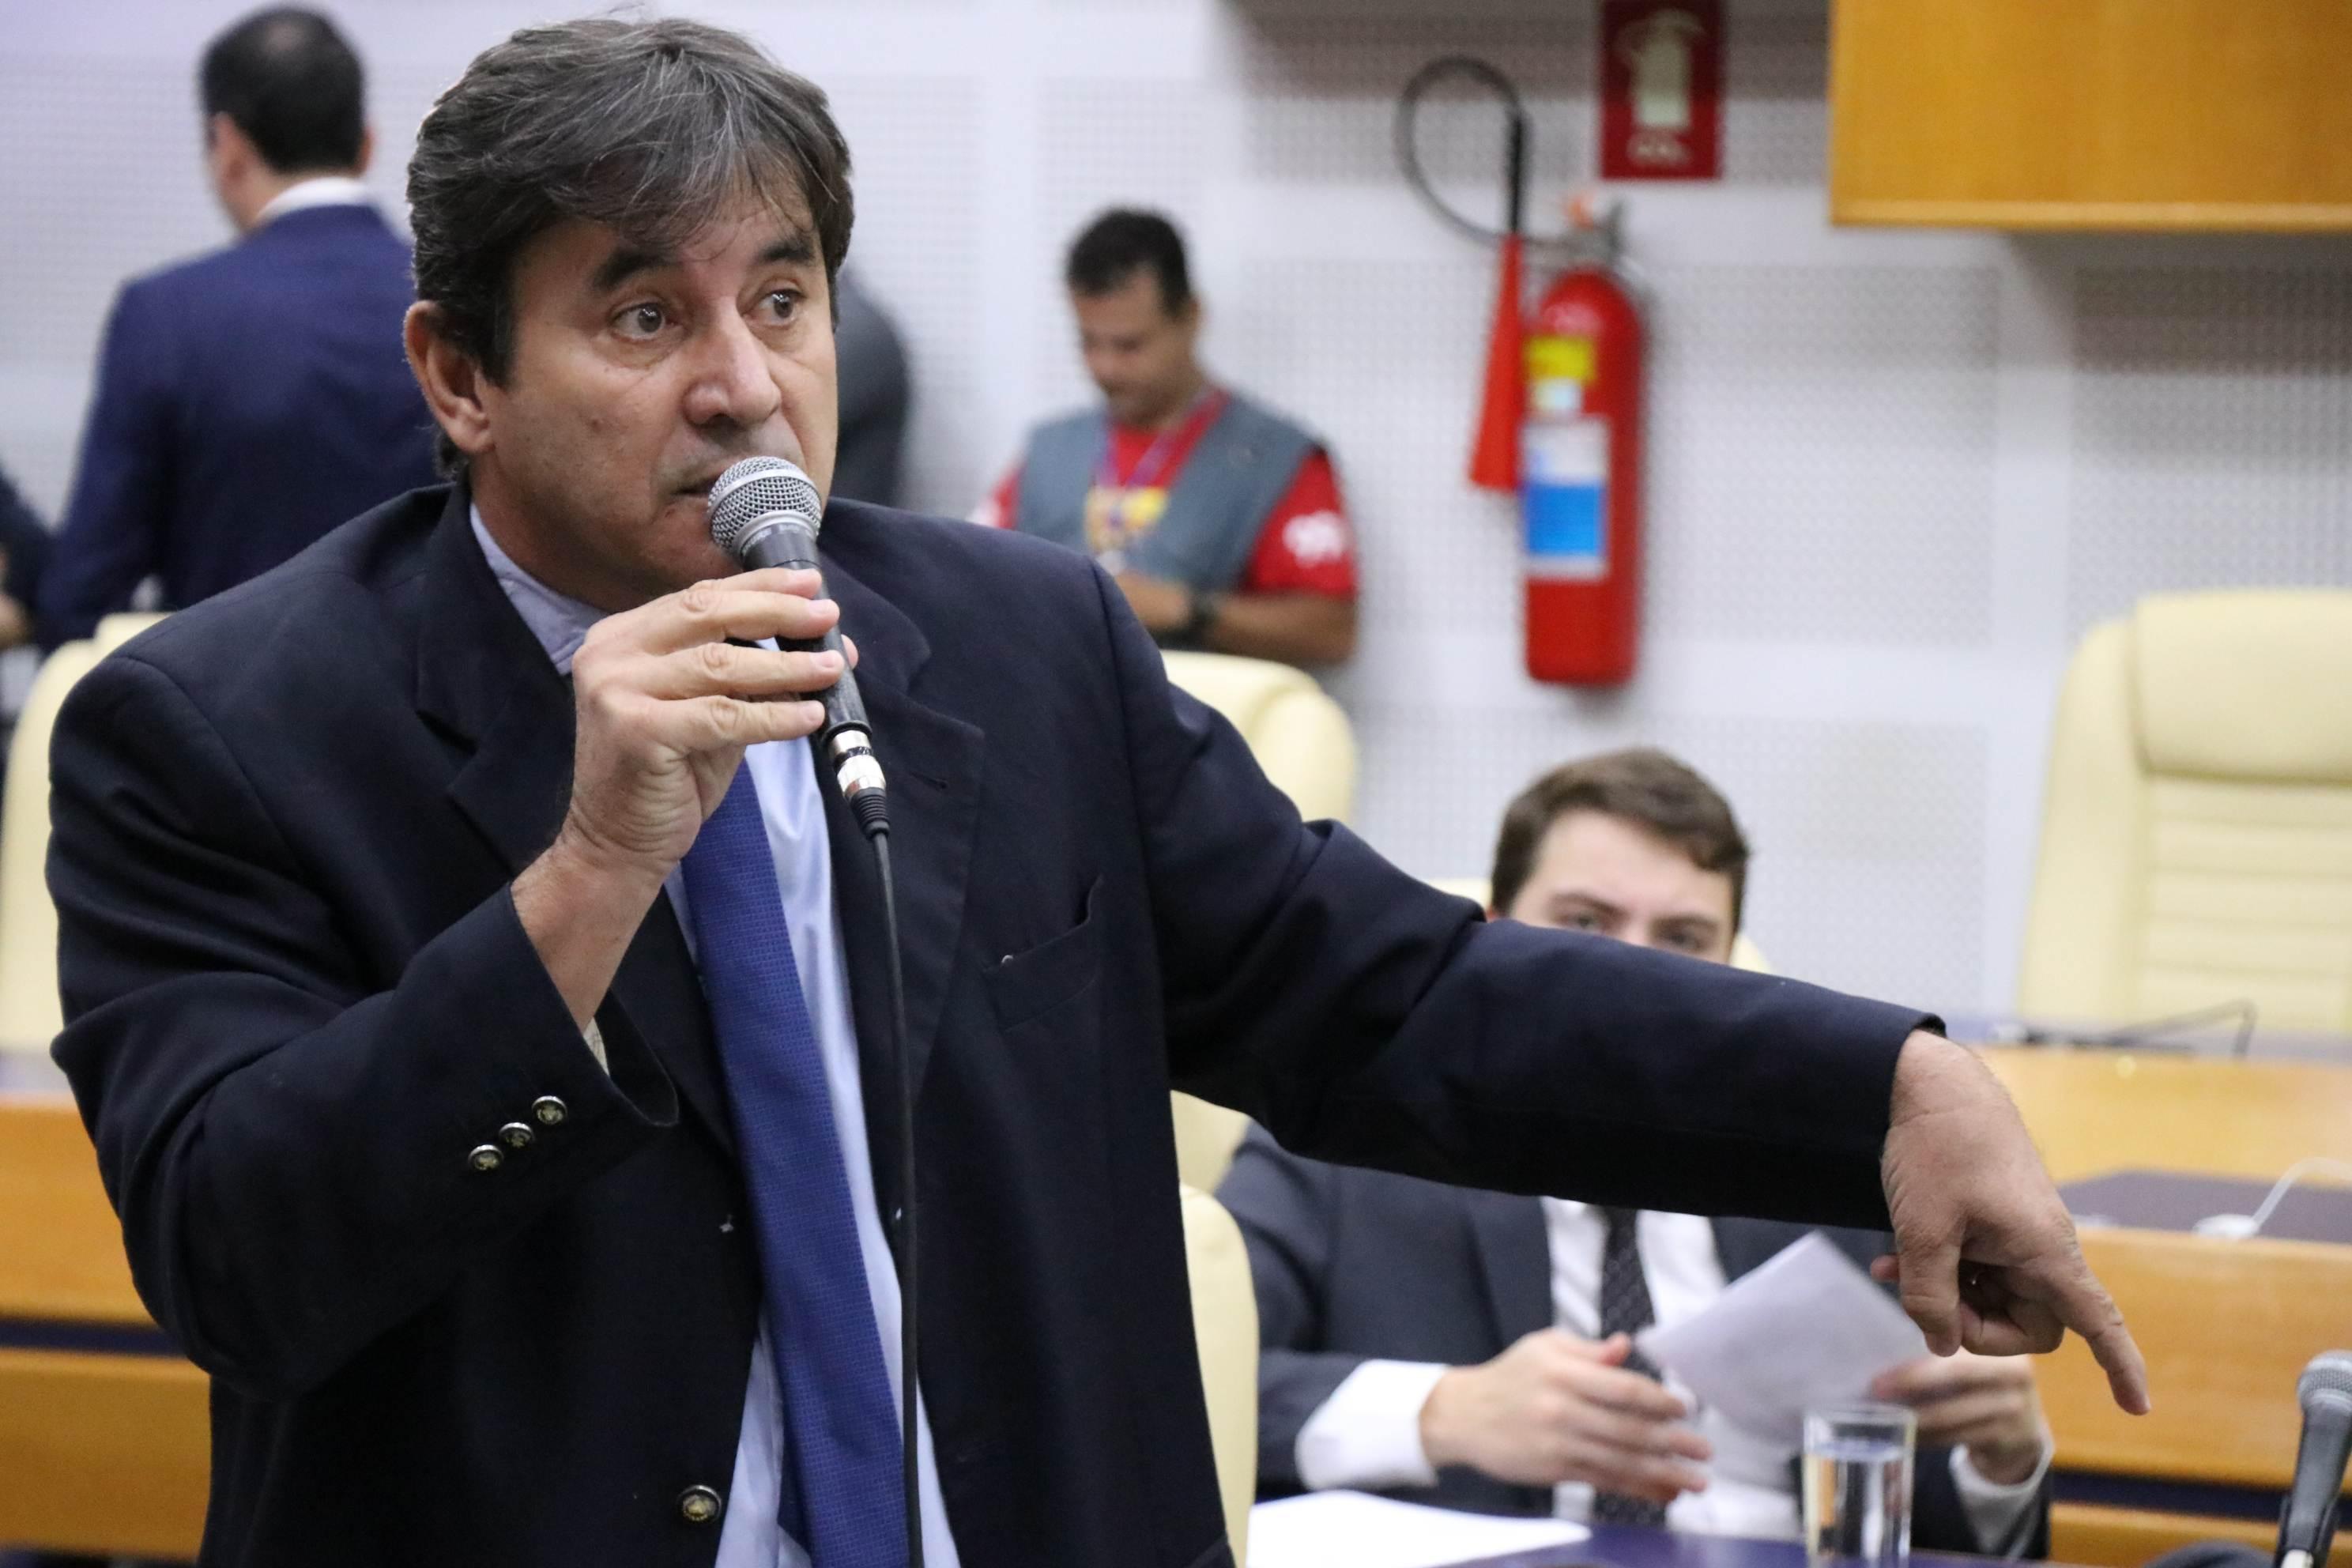 Autor do projeto de lei é overeador Clécio Alves (MDB) | Foto: Alberto Maia